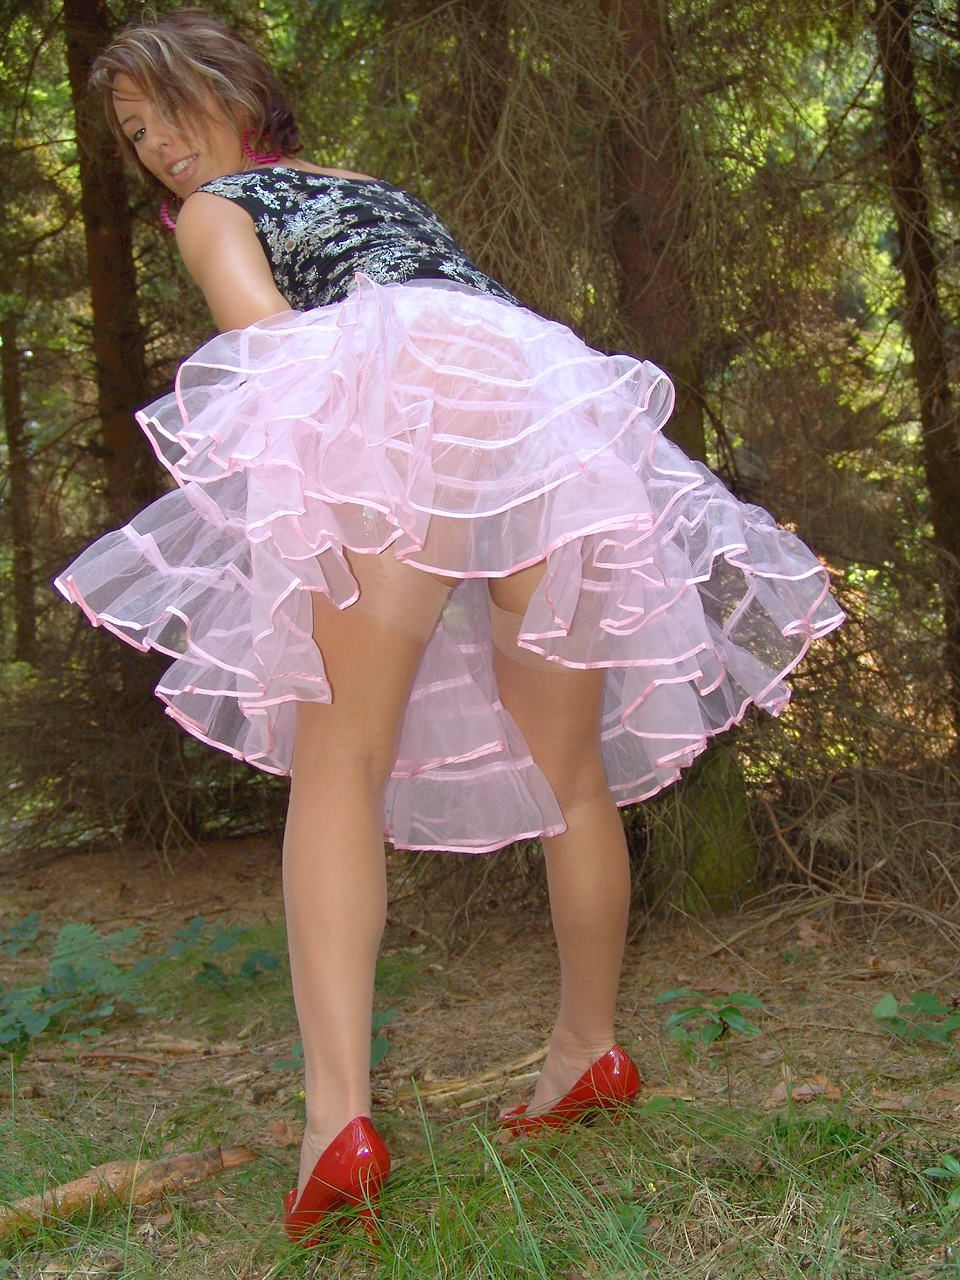 Miss nude hong kong contestants